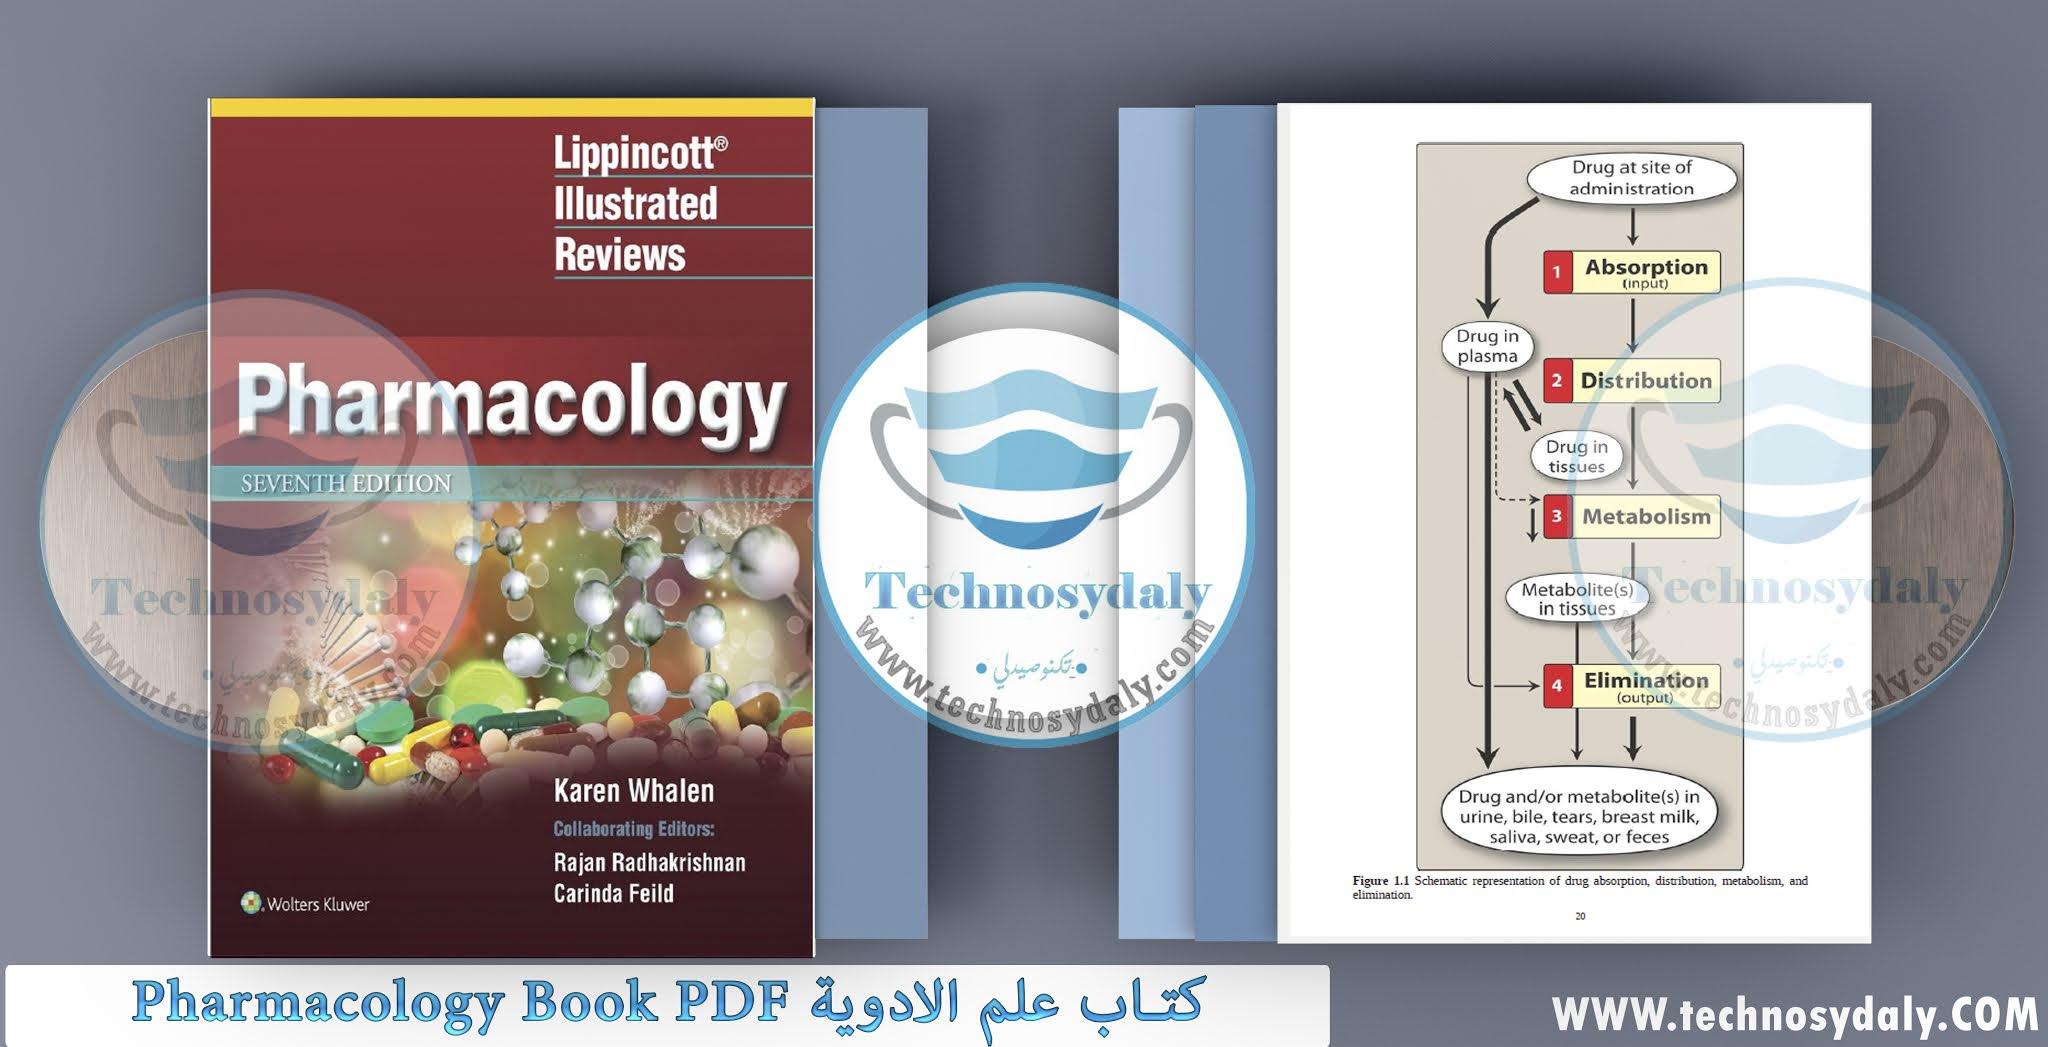 Pharmacology Book Pdf